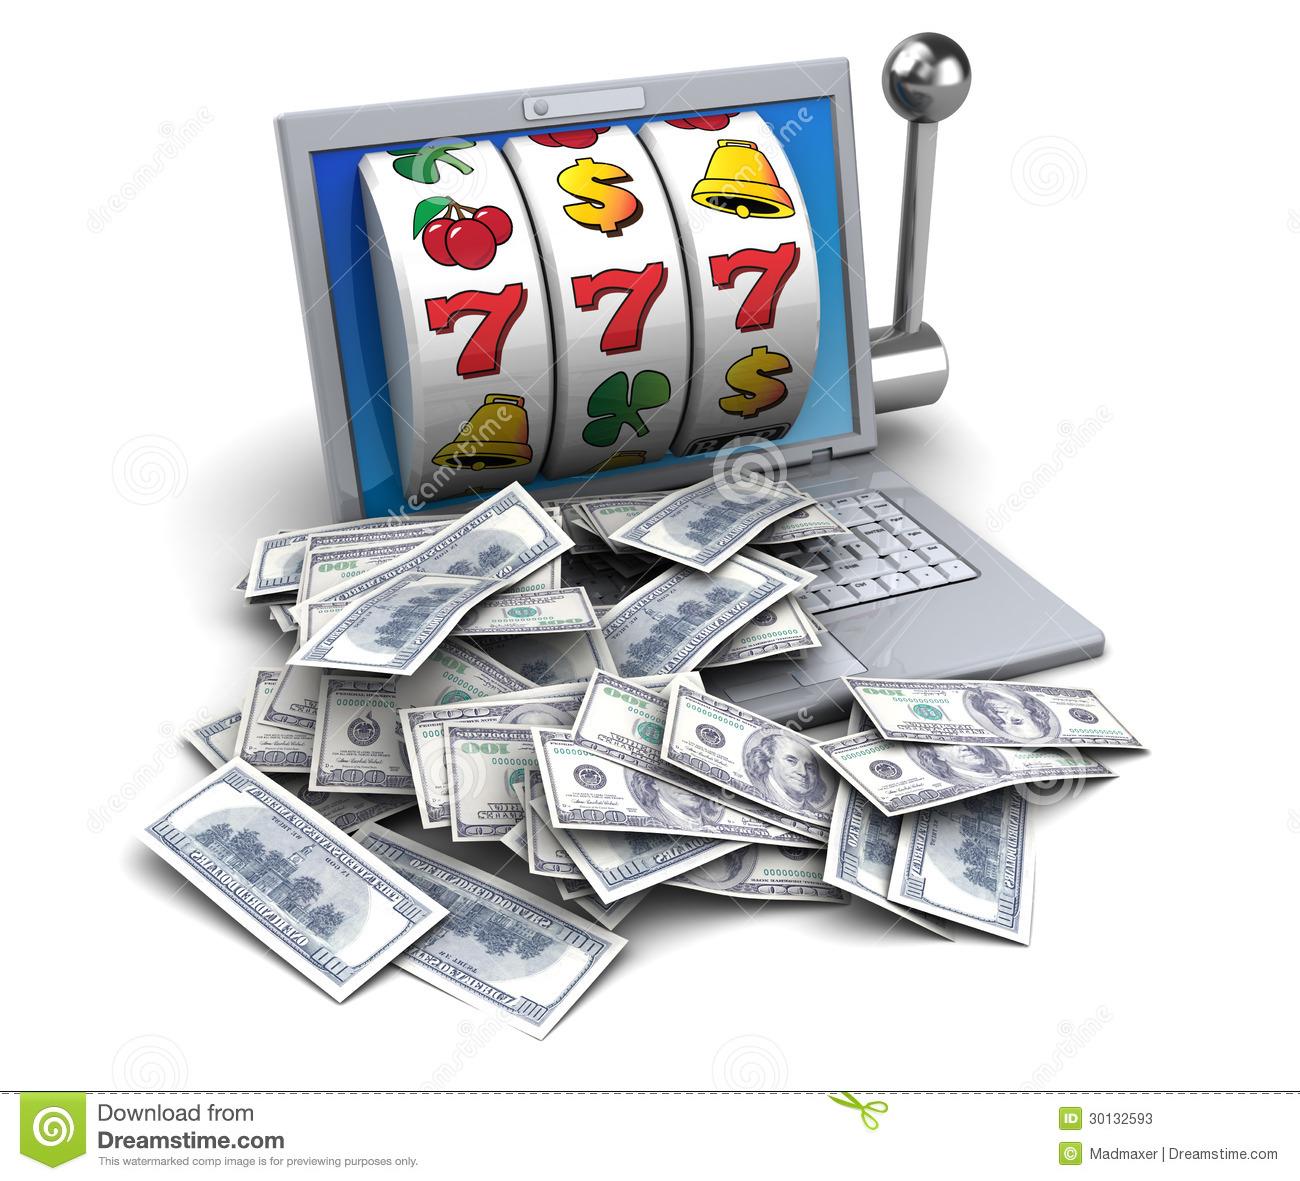 казино с бонусами без депозита онлайн